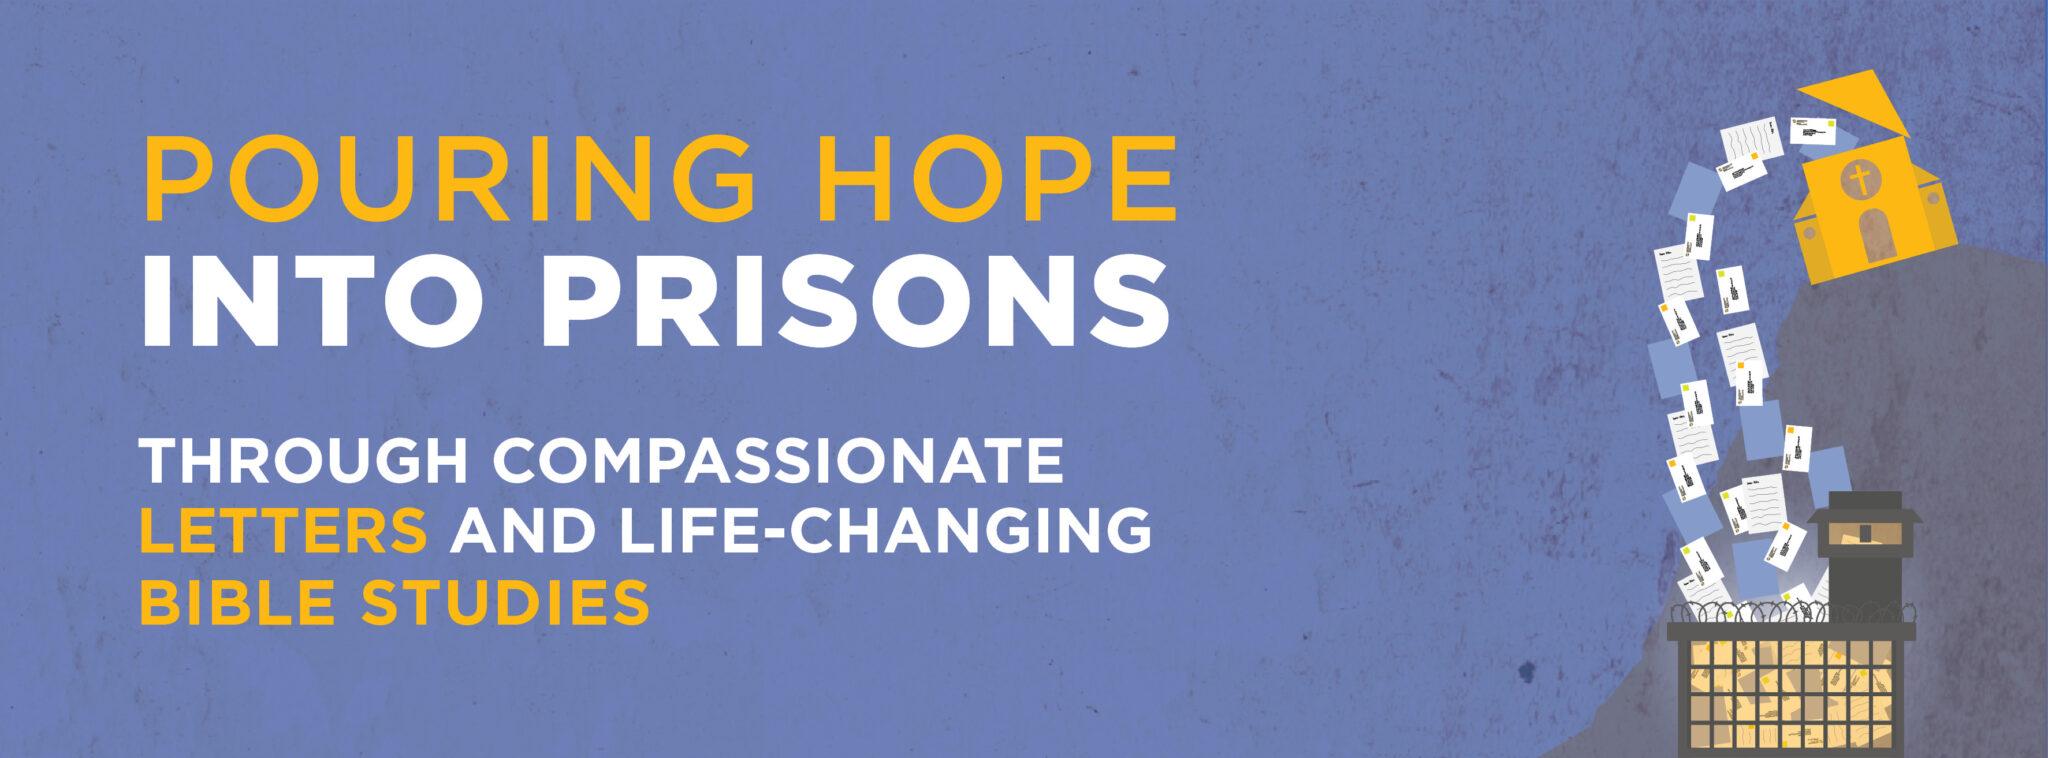 Crossroads Prison Ministries - Reaching God's People in Prison